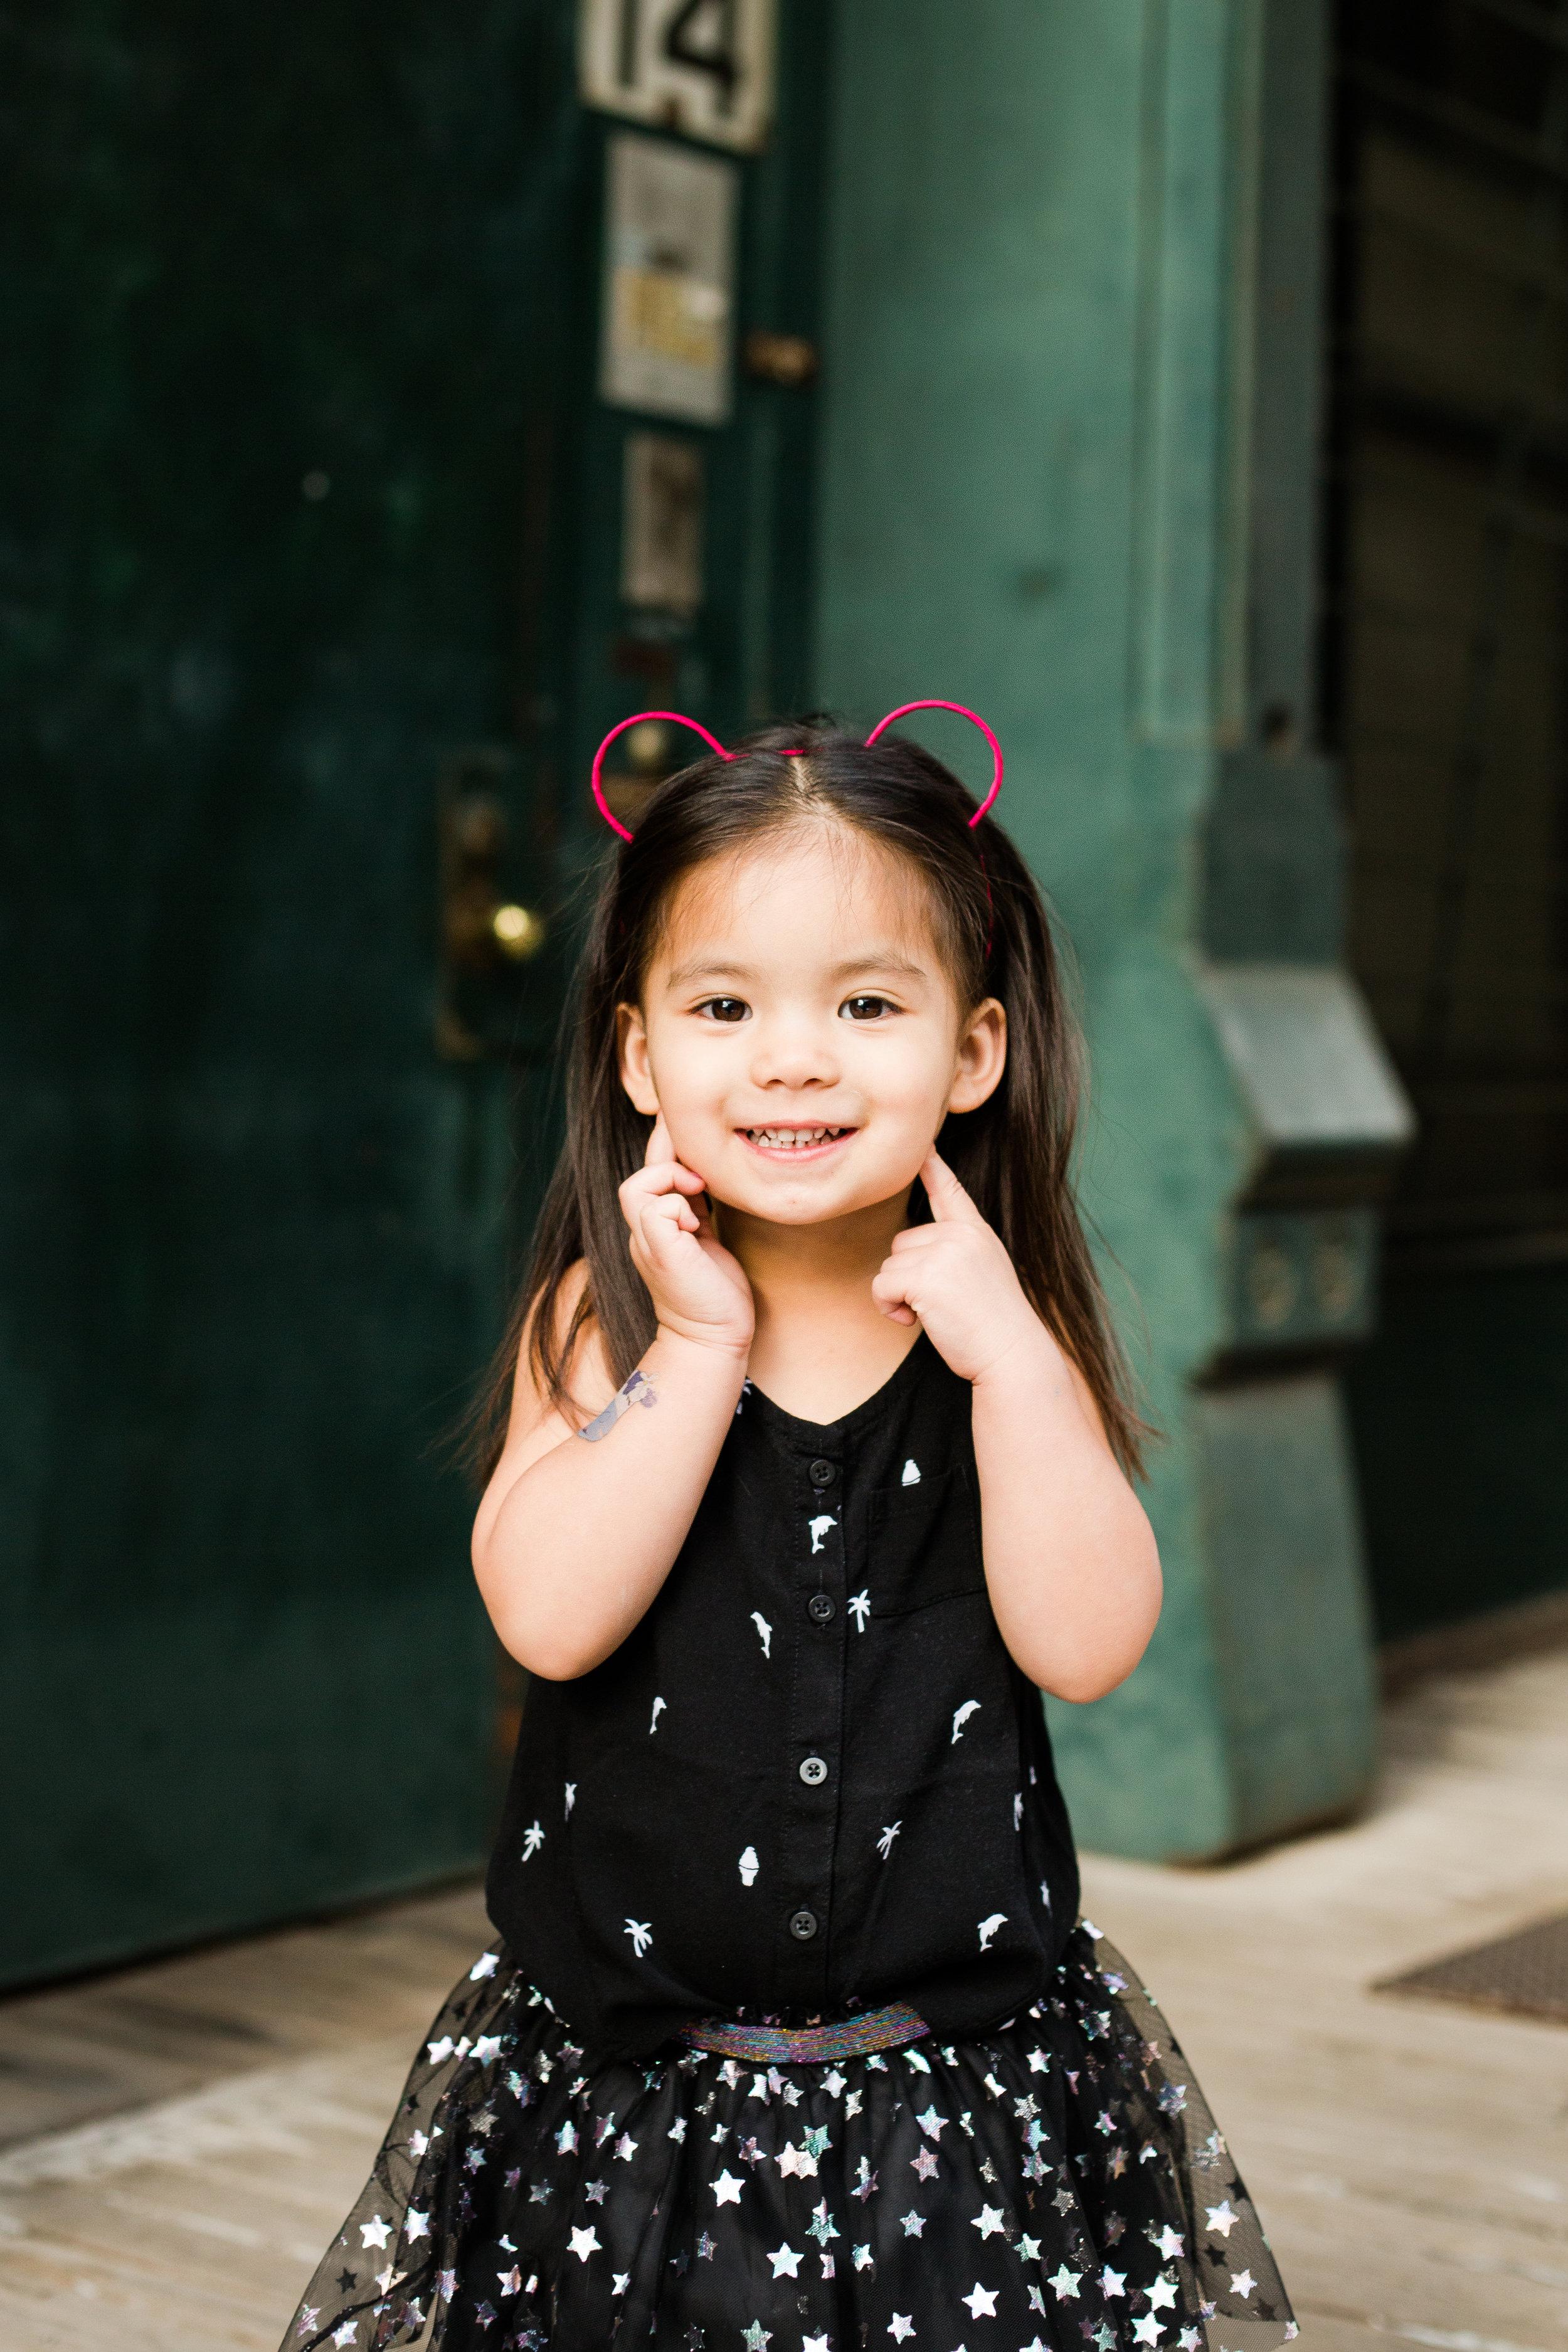 lissiephoto_loomis_nyc_family_photography10.JPG